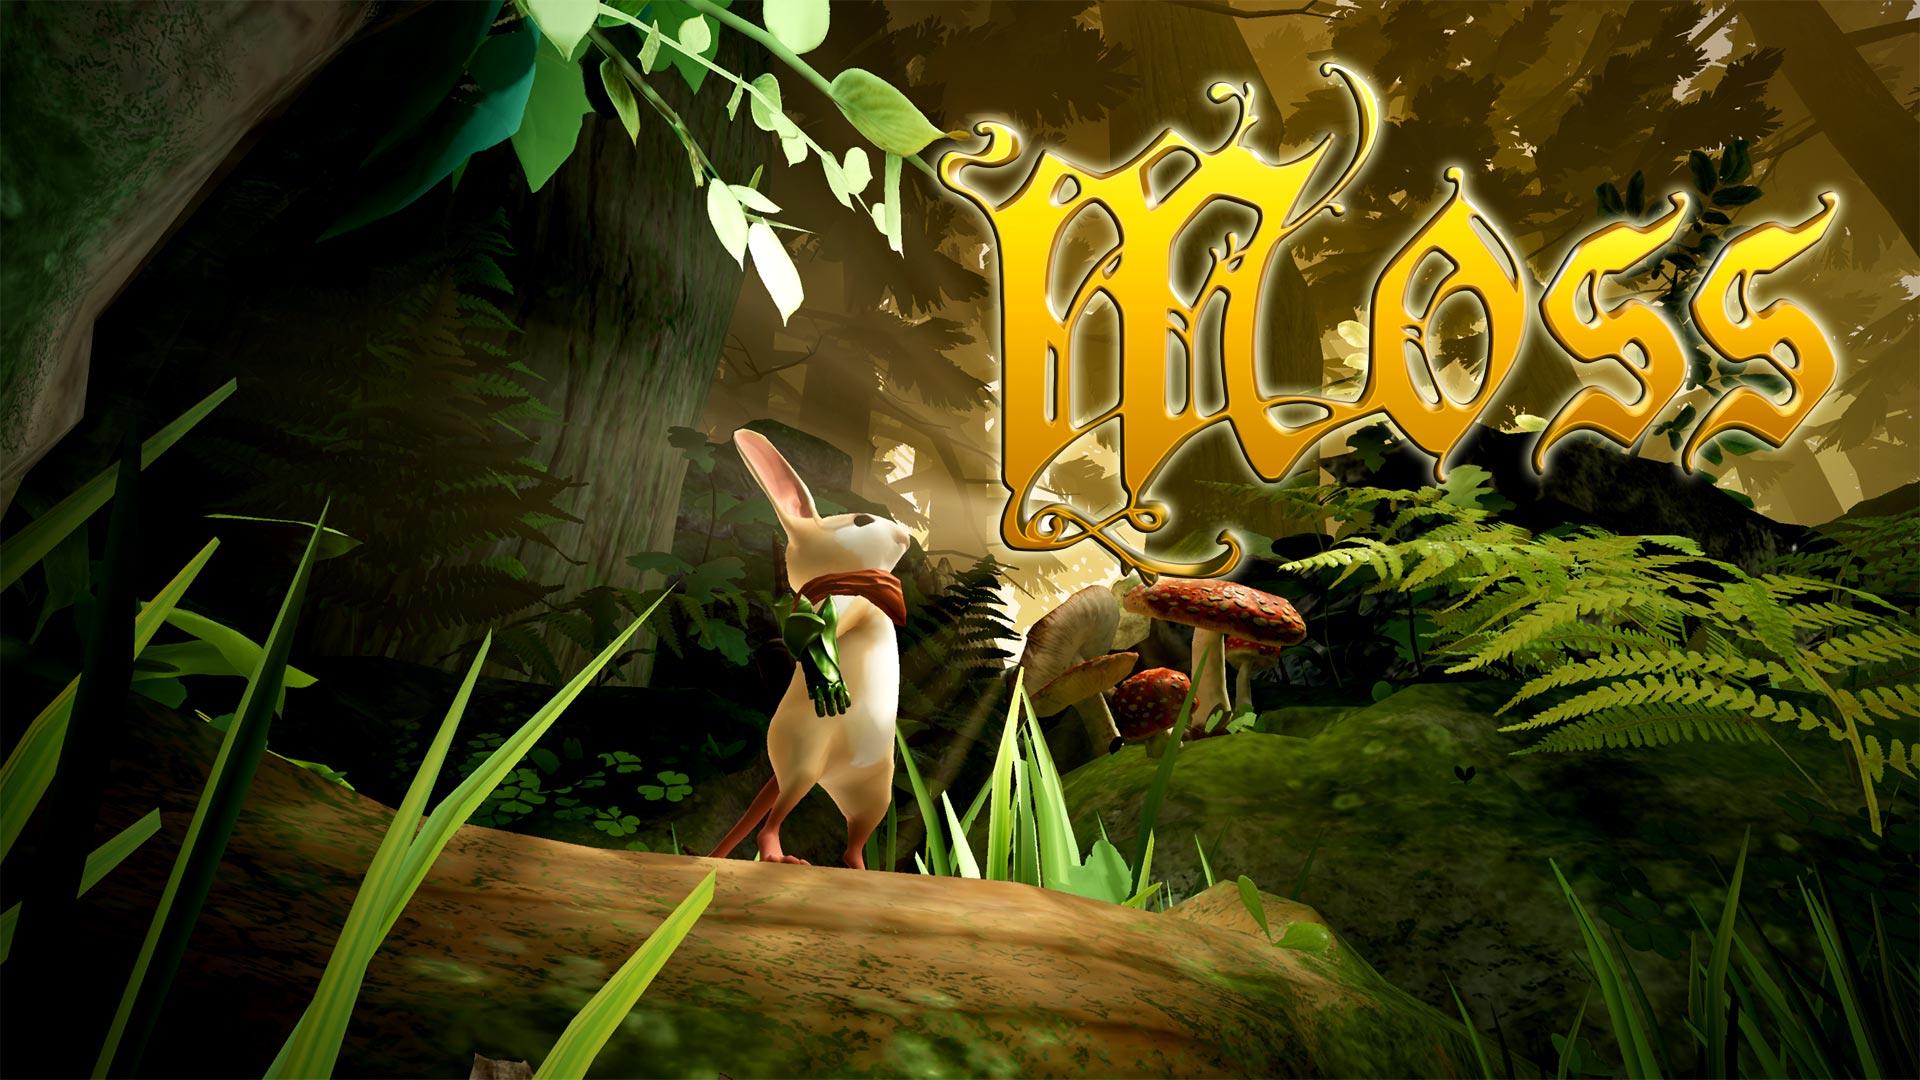 Top 10 Jeux VR - 02 Moss